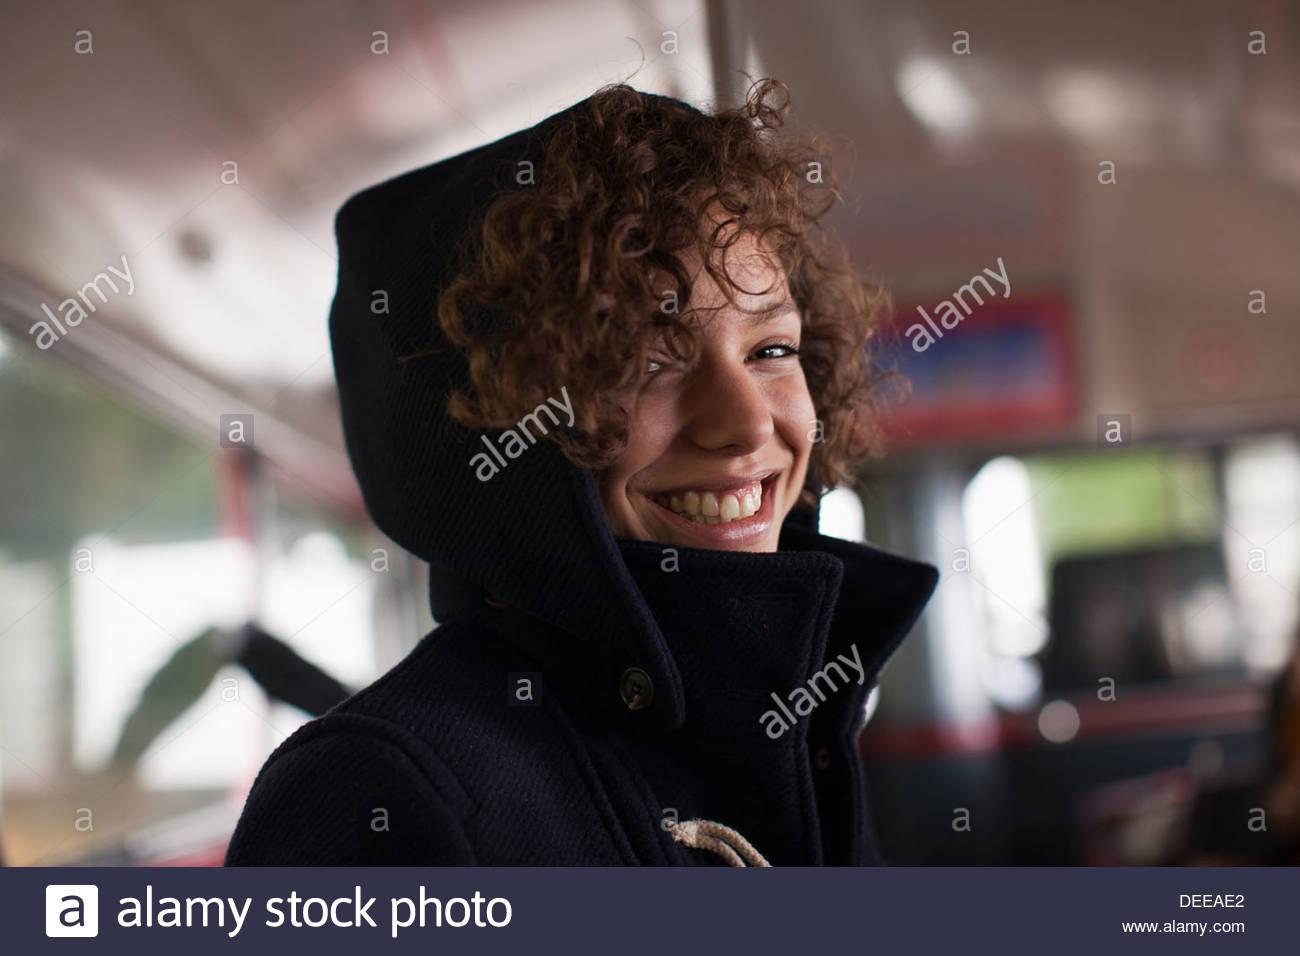 Smiling woman riding bus - Stock Image